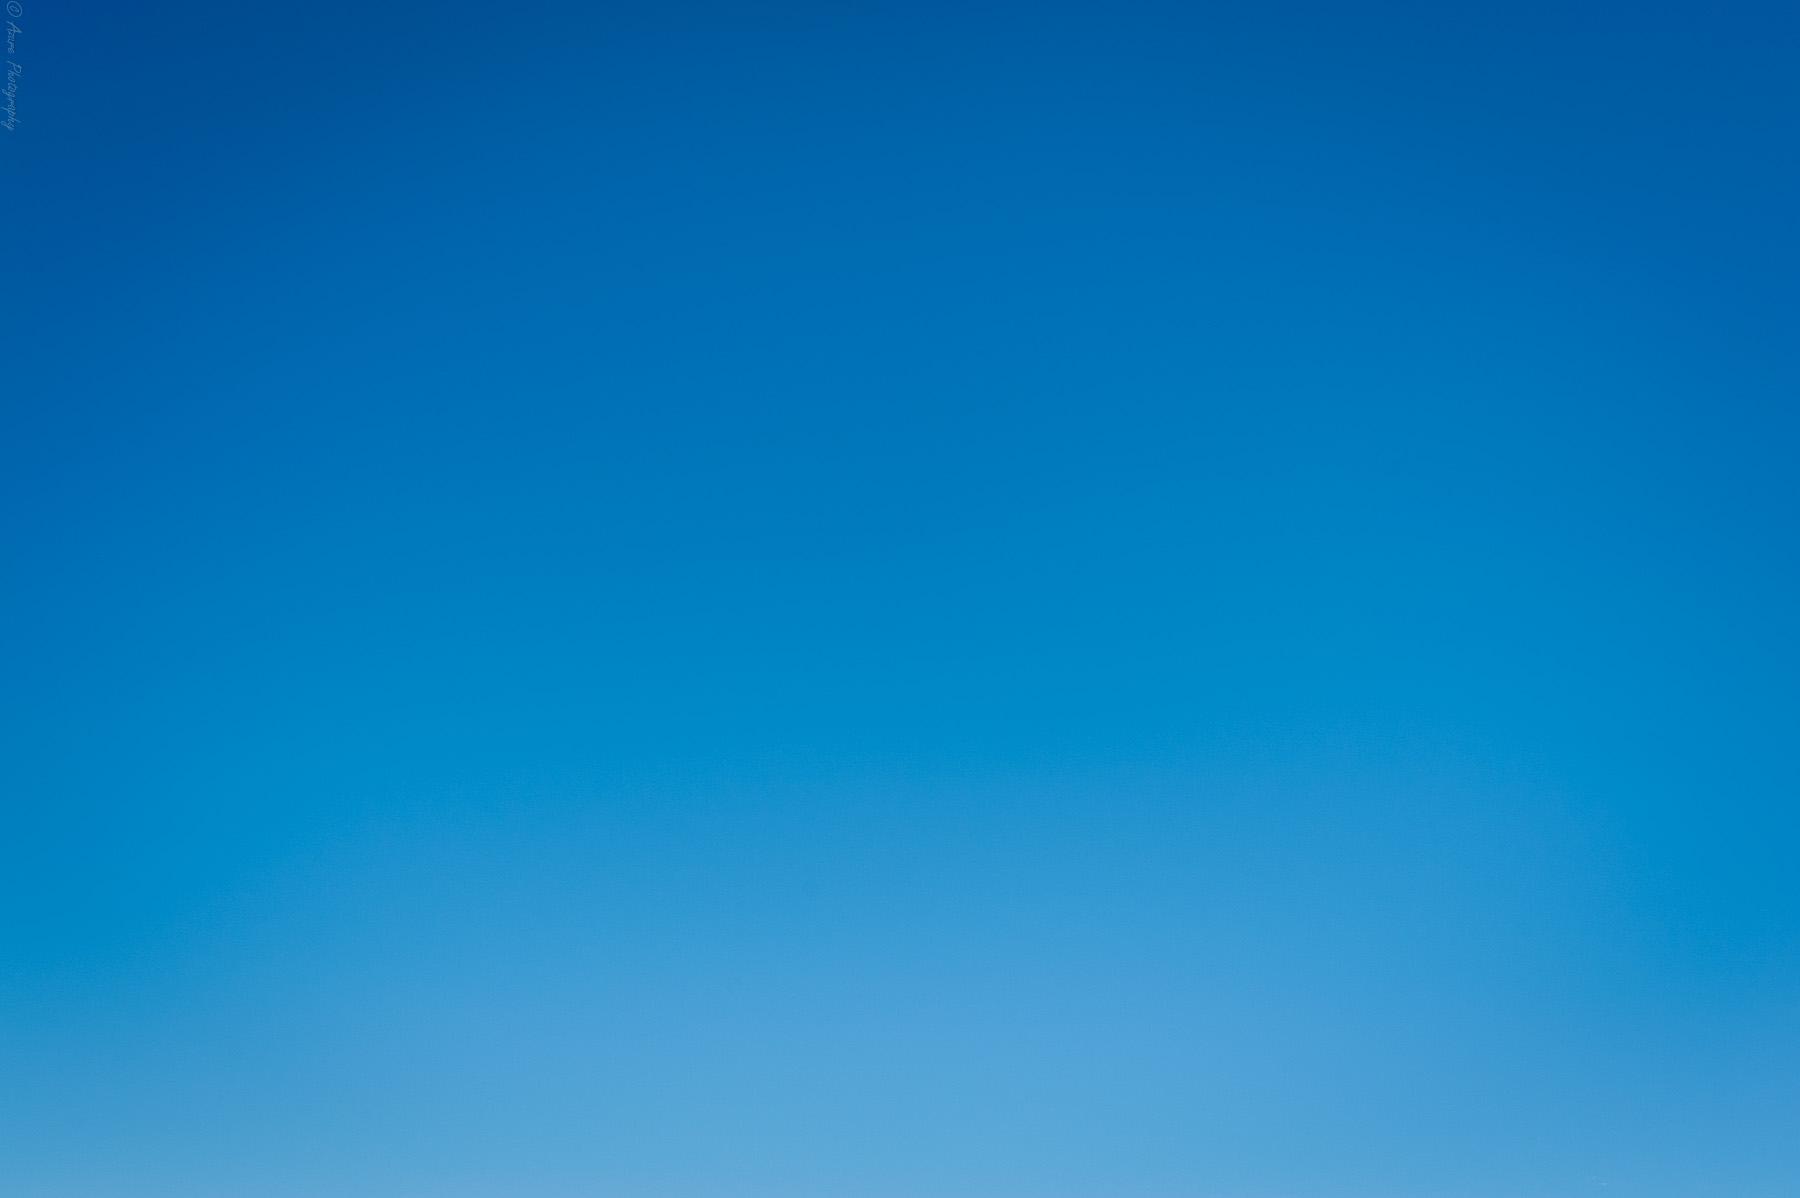 Clear Blue Sky by nescio17 on DeviantArt